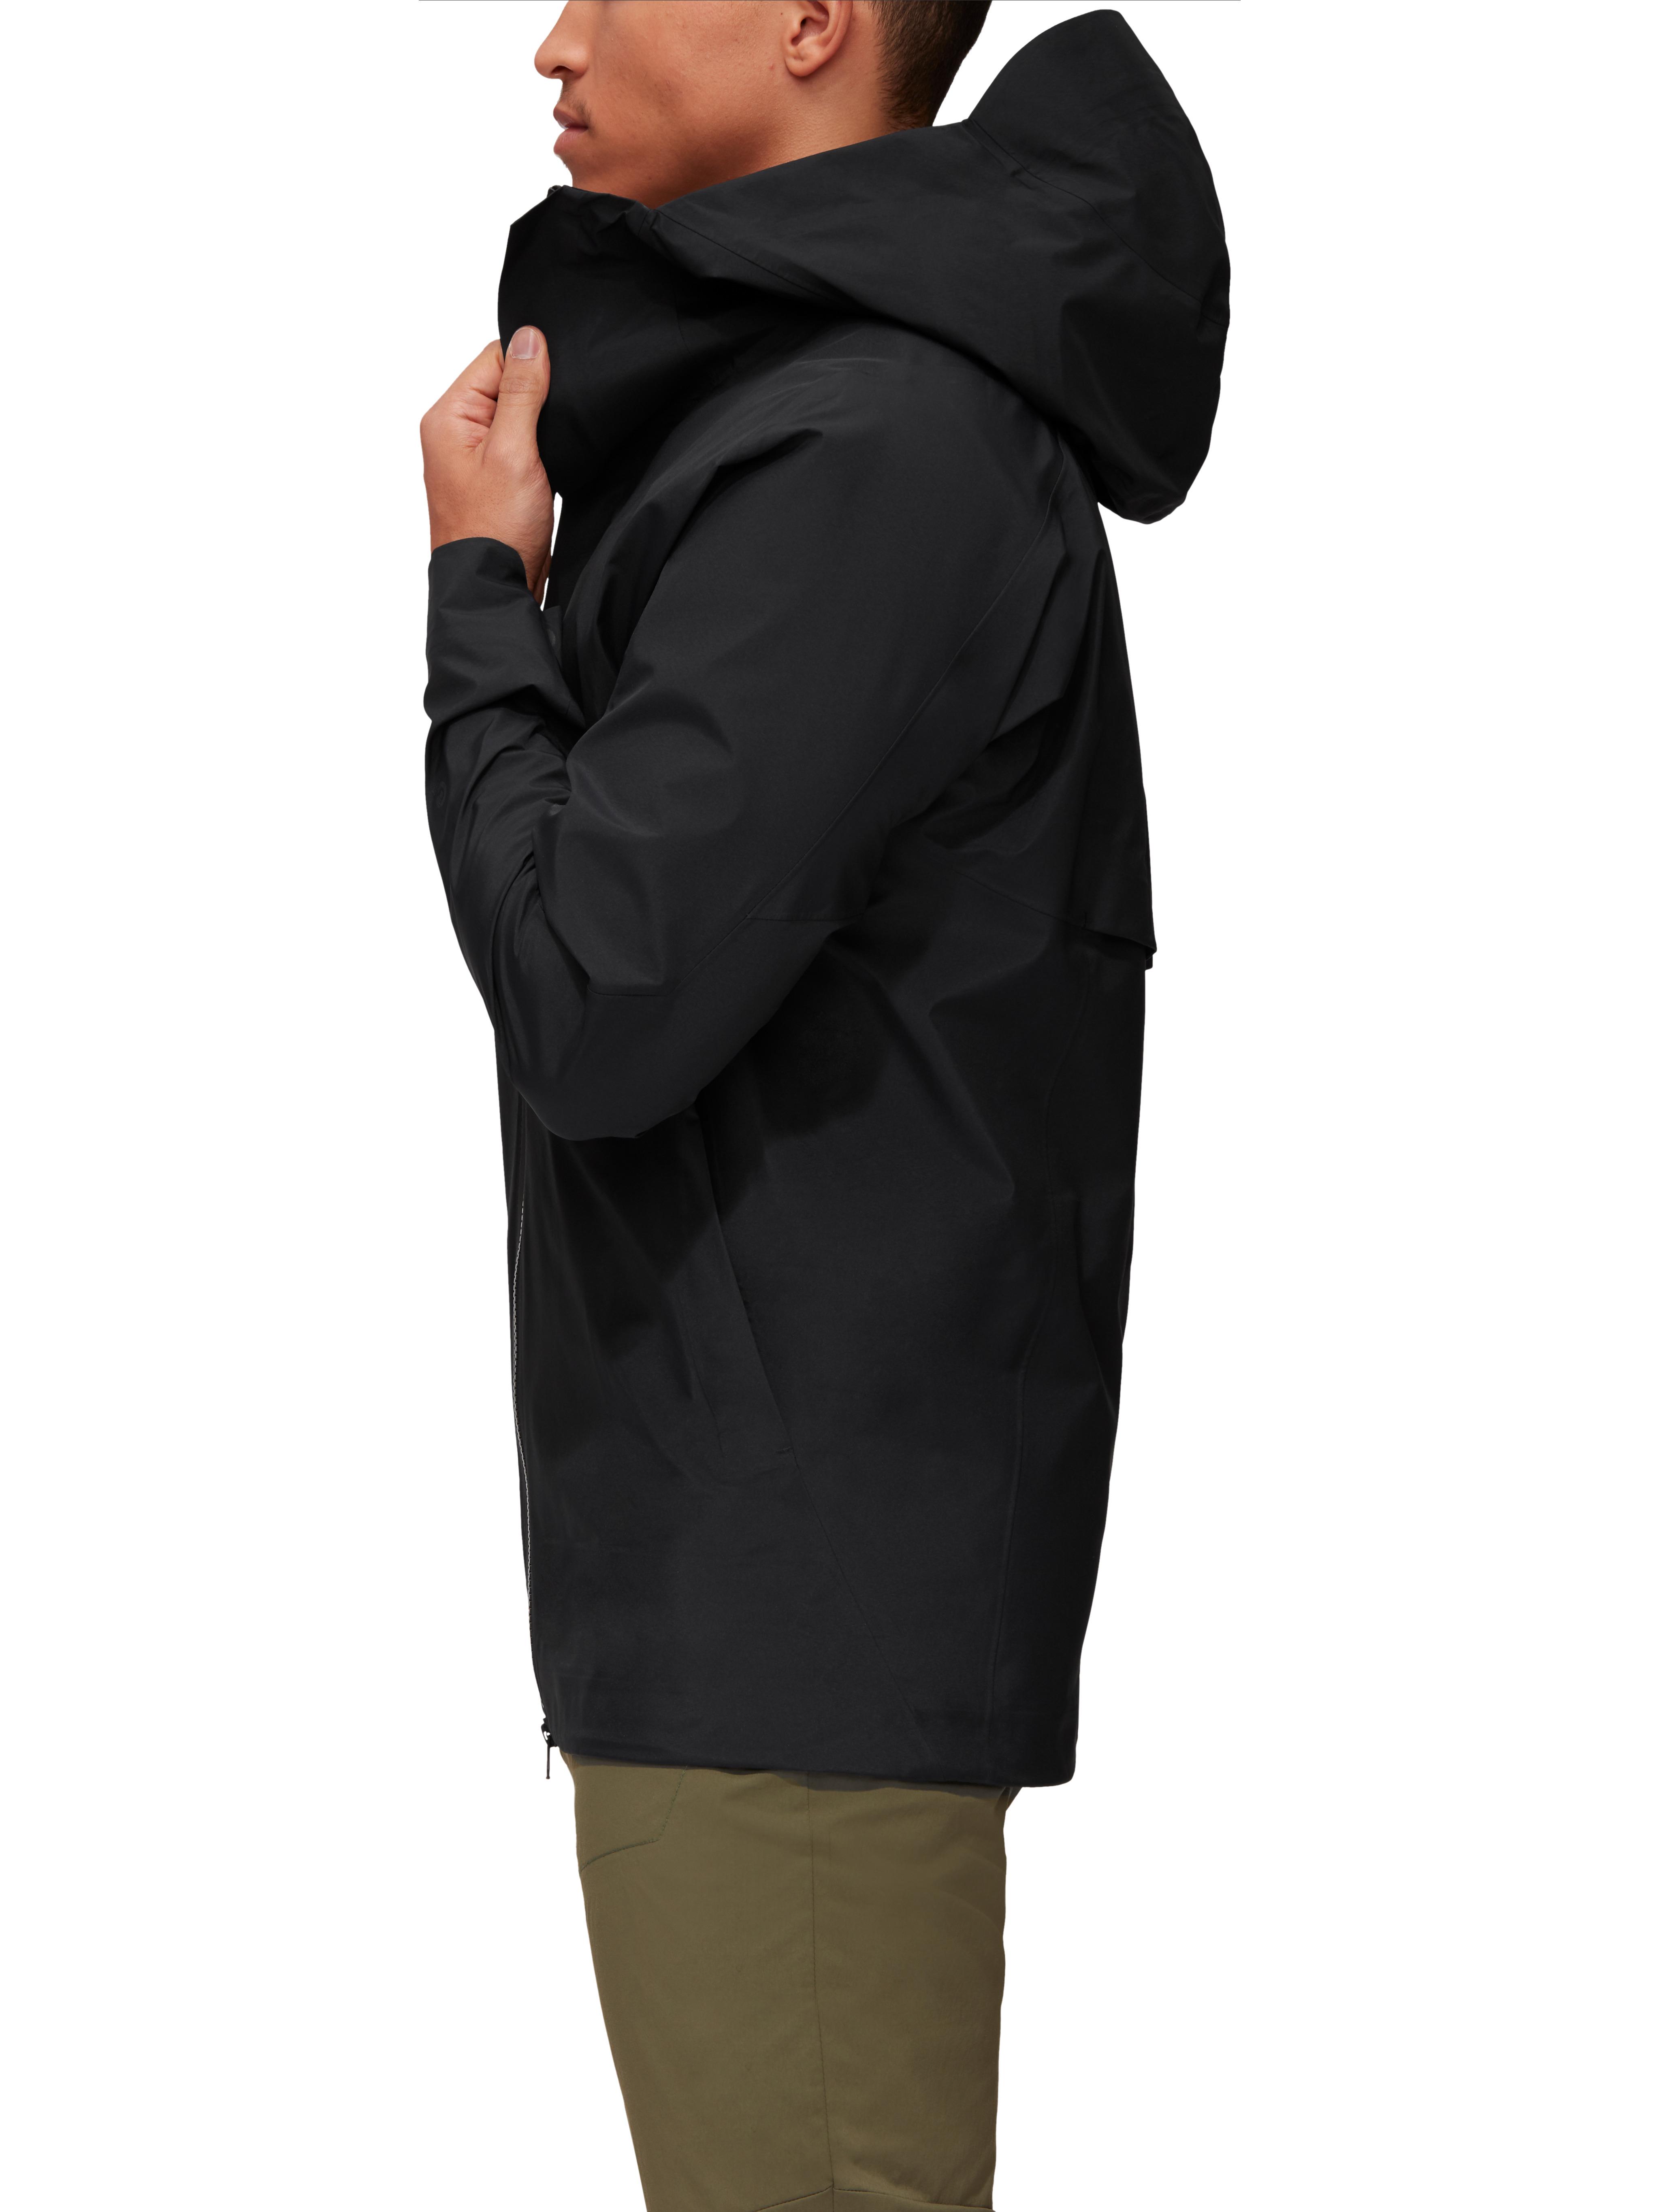 3850 HS Hooded Jacket Men product image